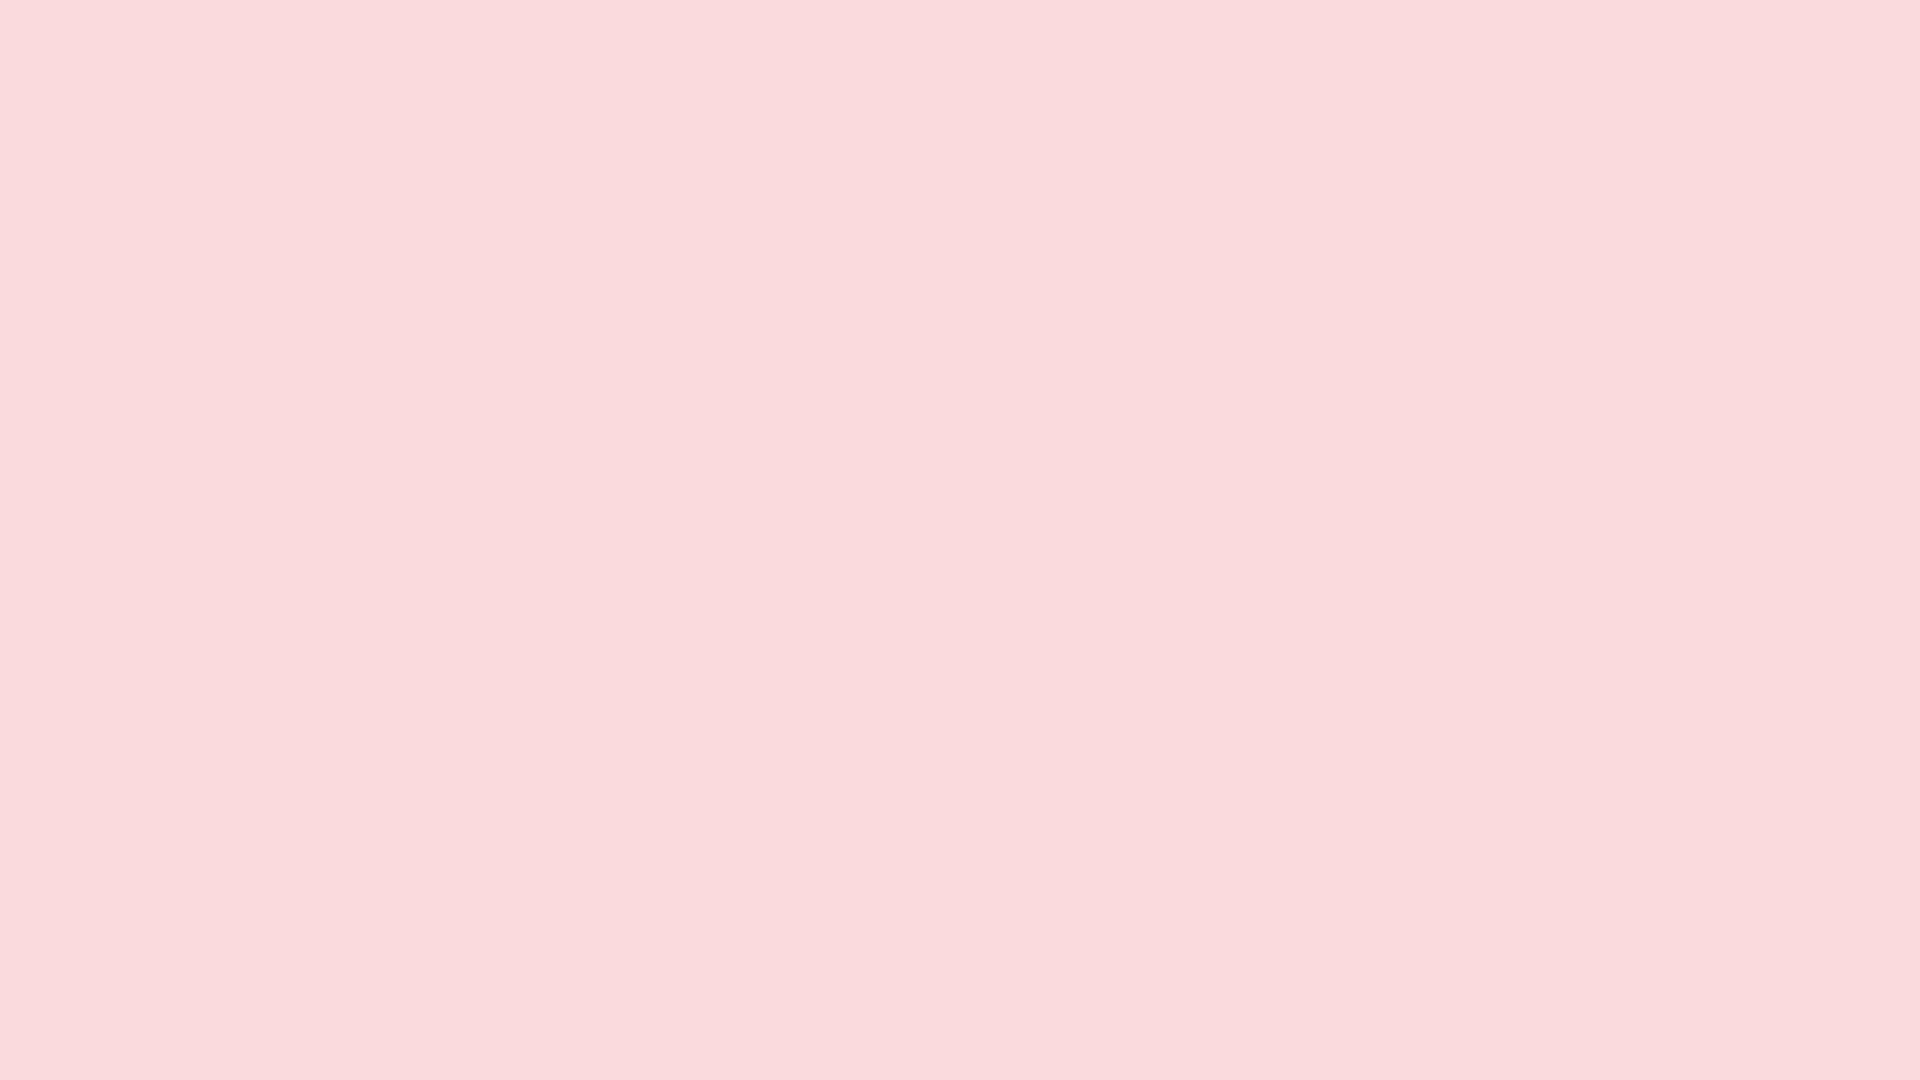 light-pink-background-8283